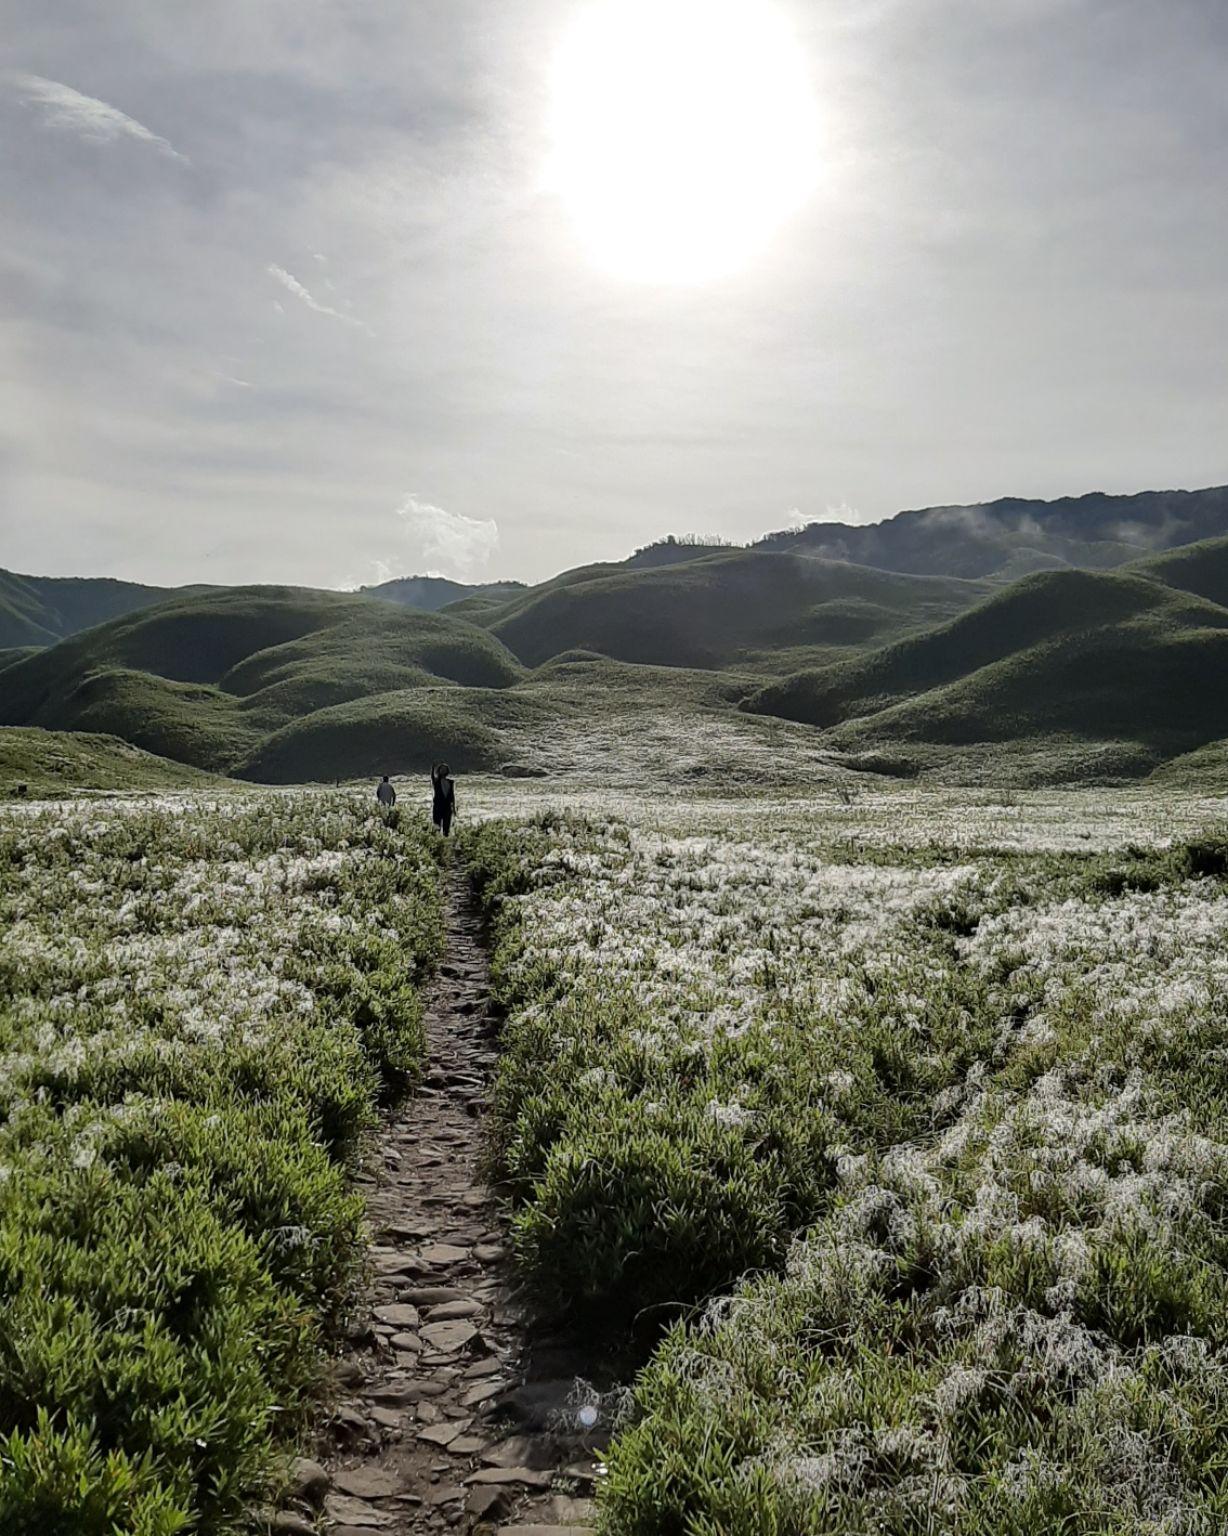 Photo of Dzükou Valley By Deepak samal